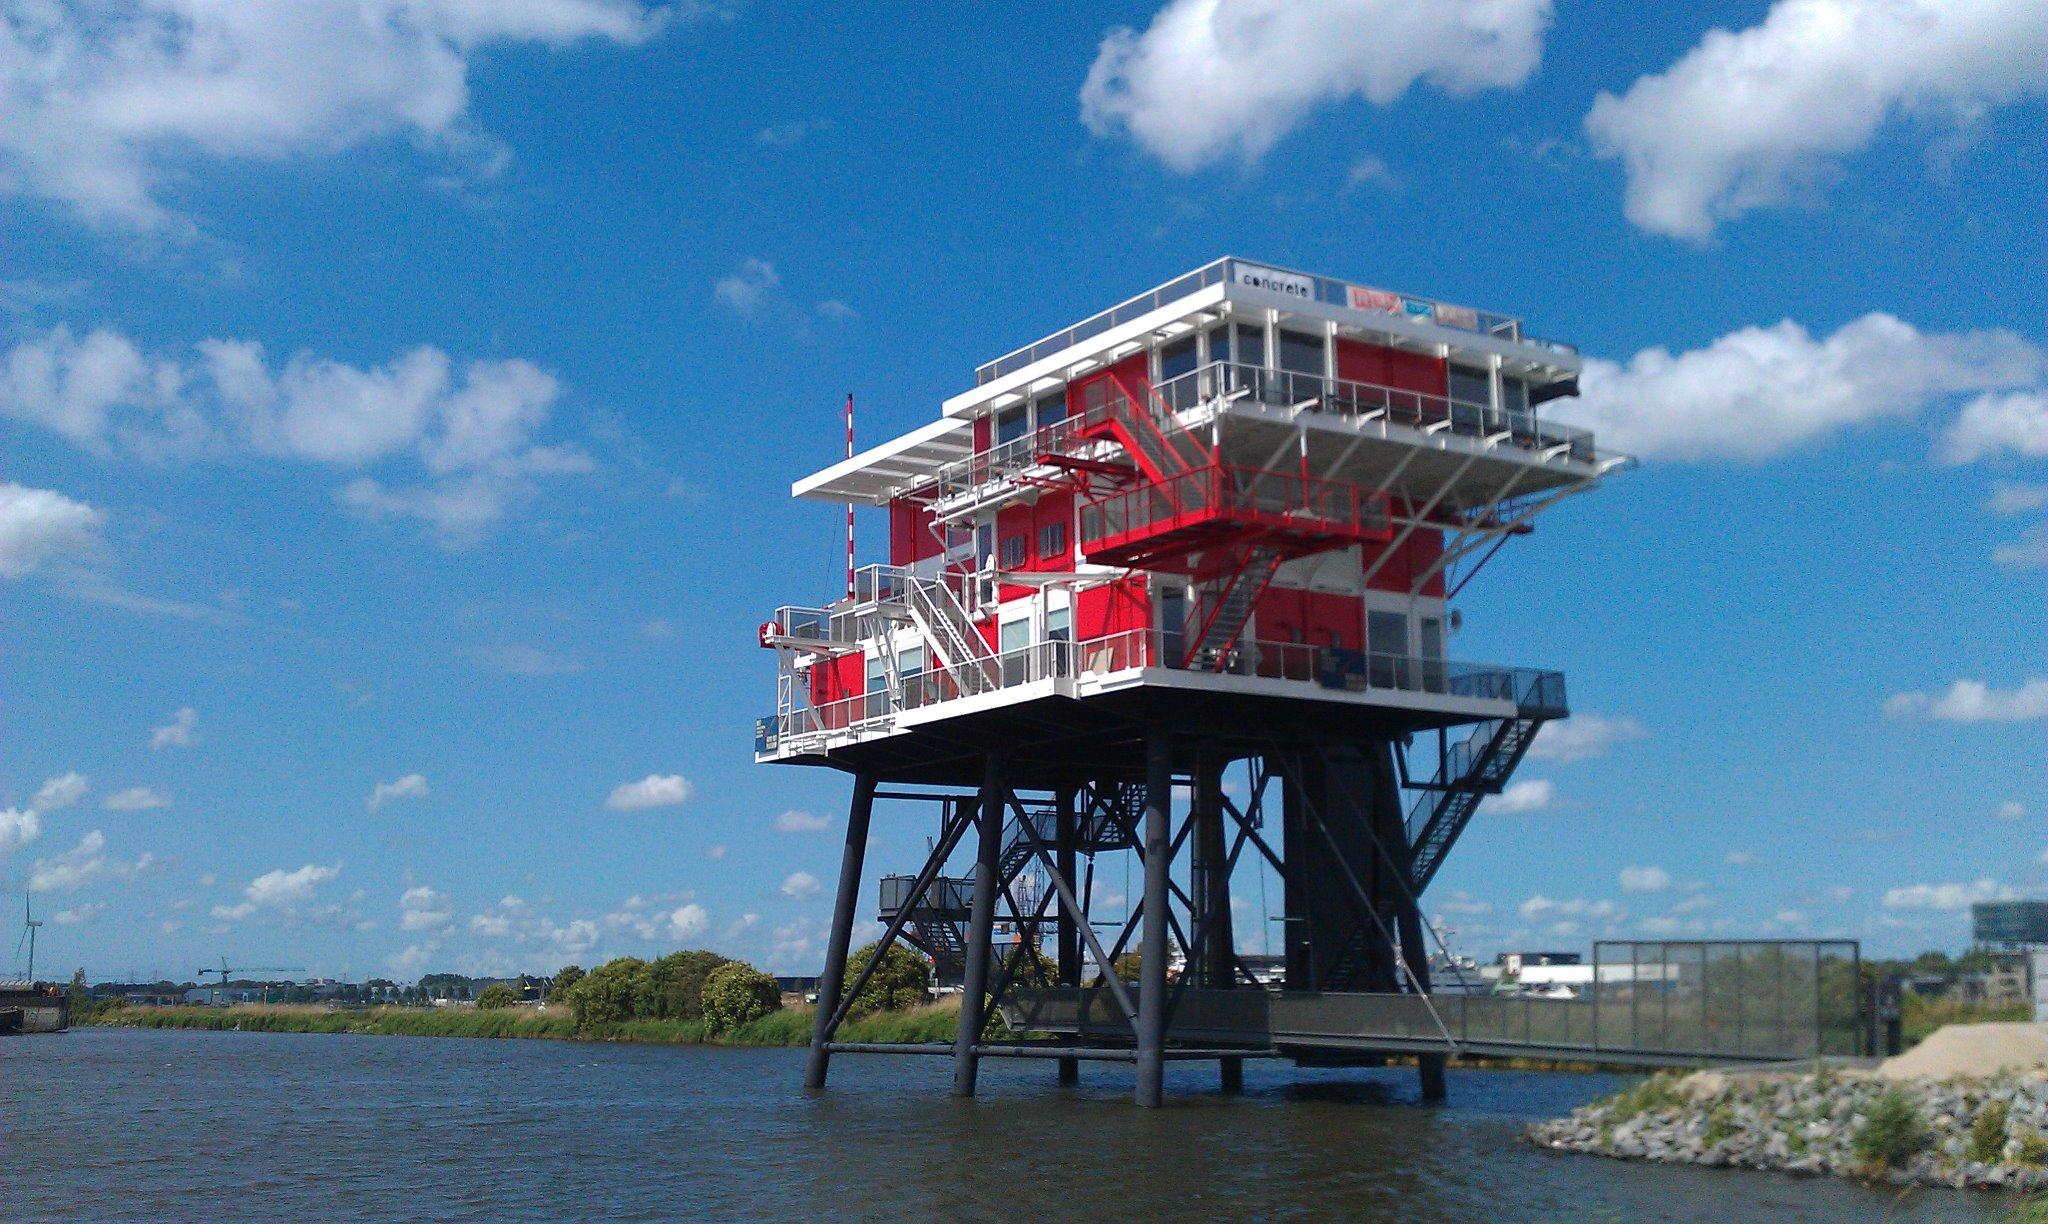 Restaurant rem eiland amsterdam leuke adresjes van yvette for B b amsterdam